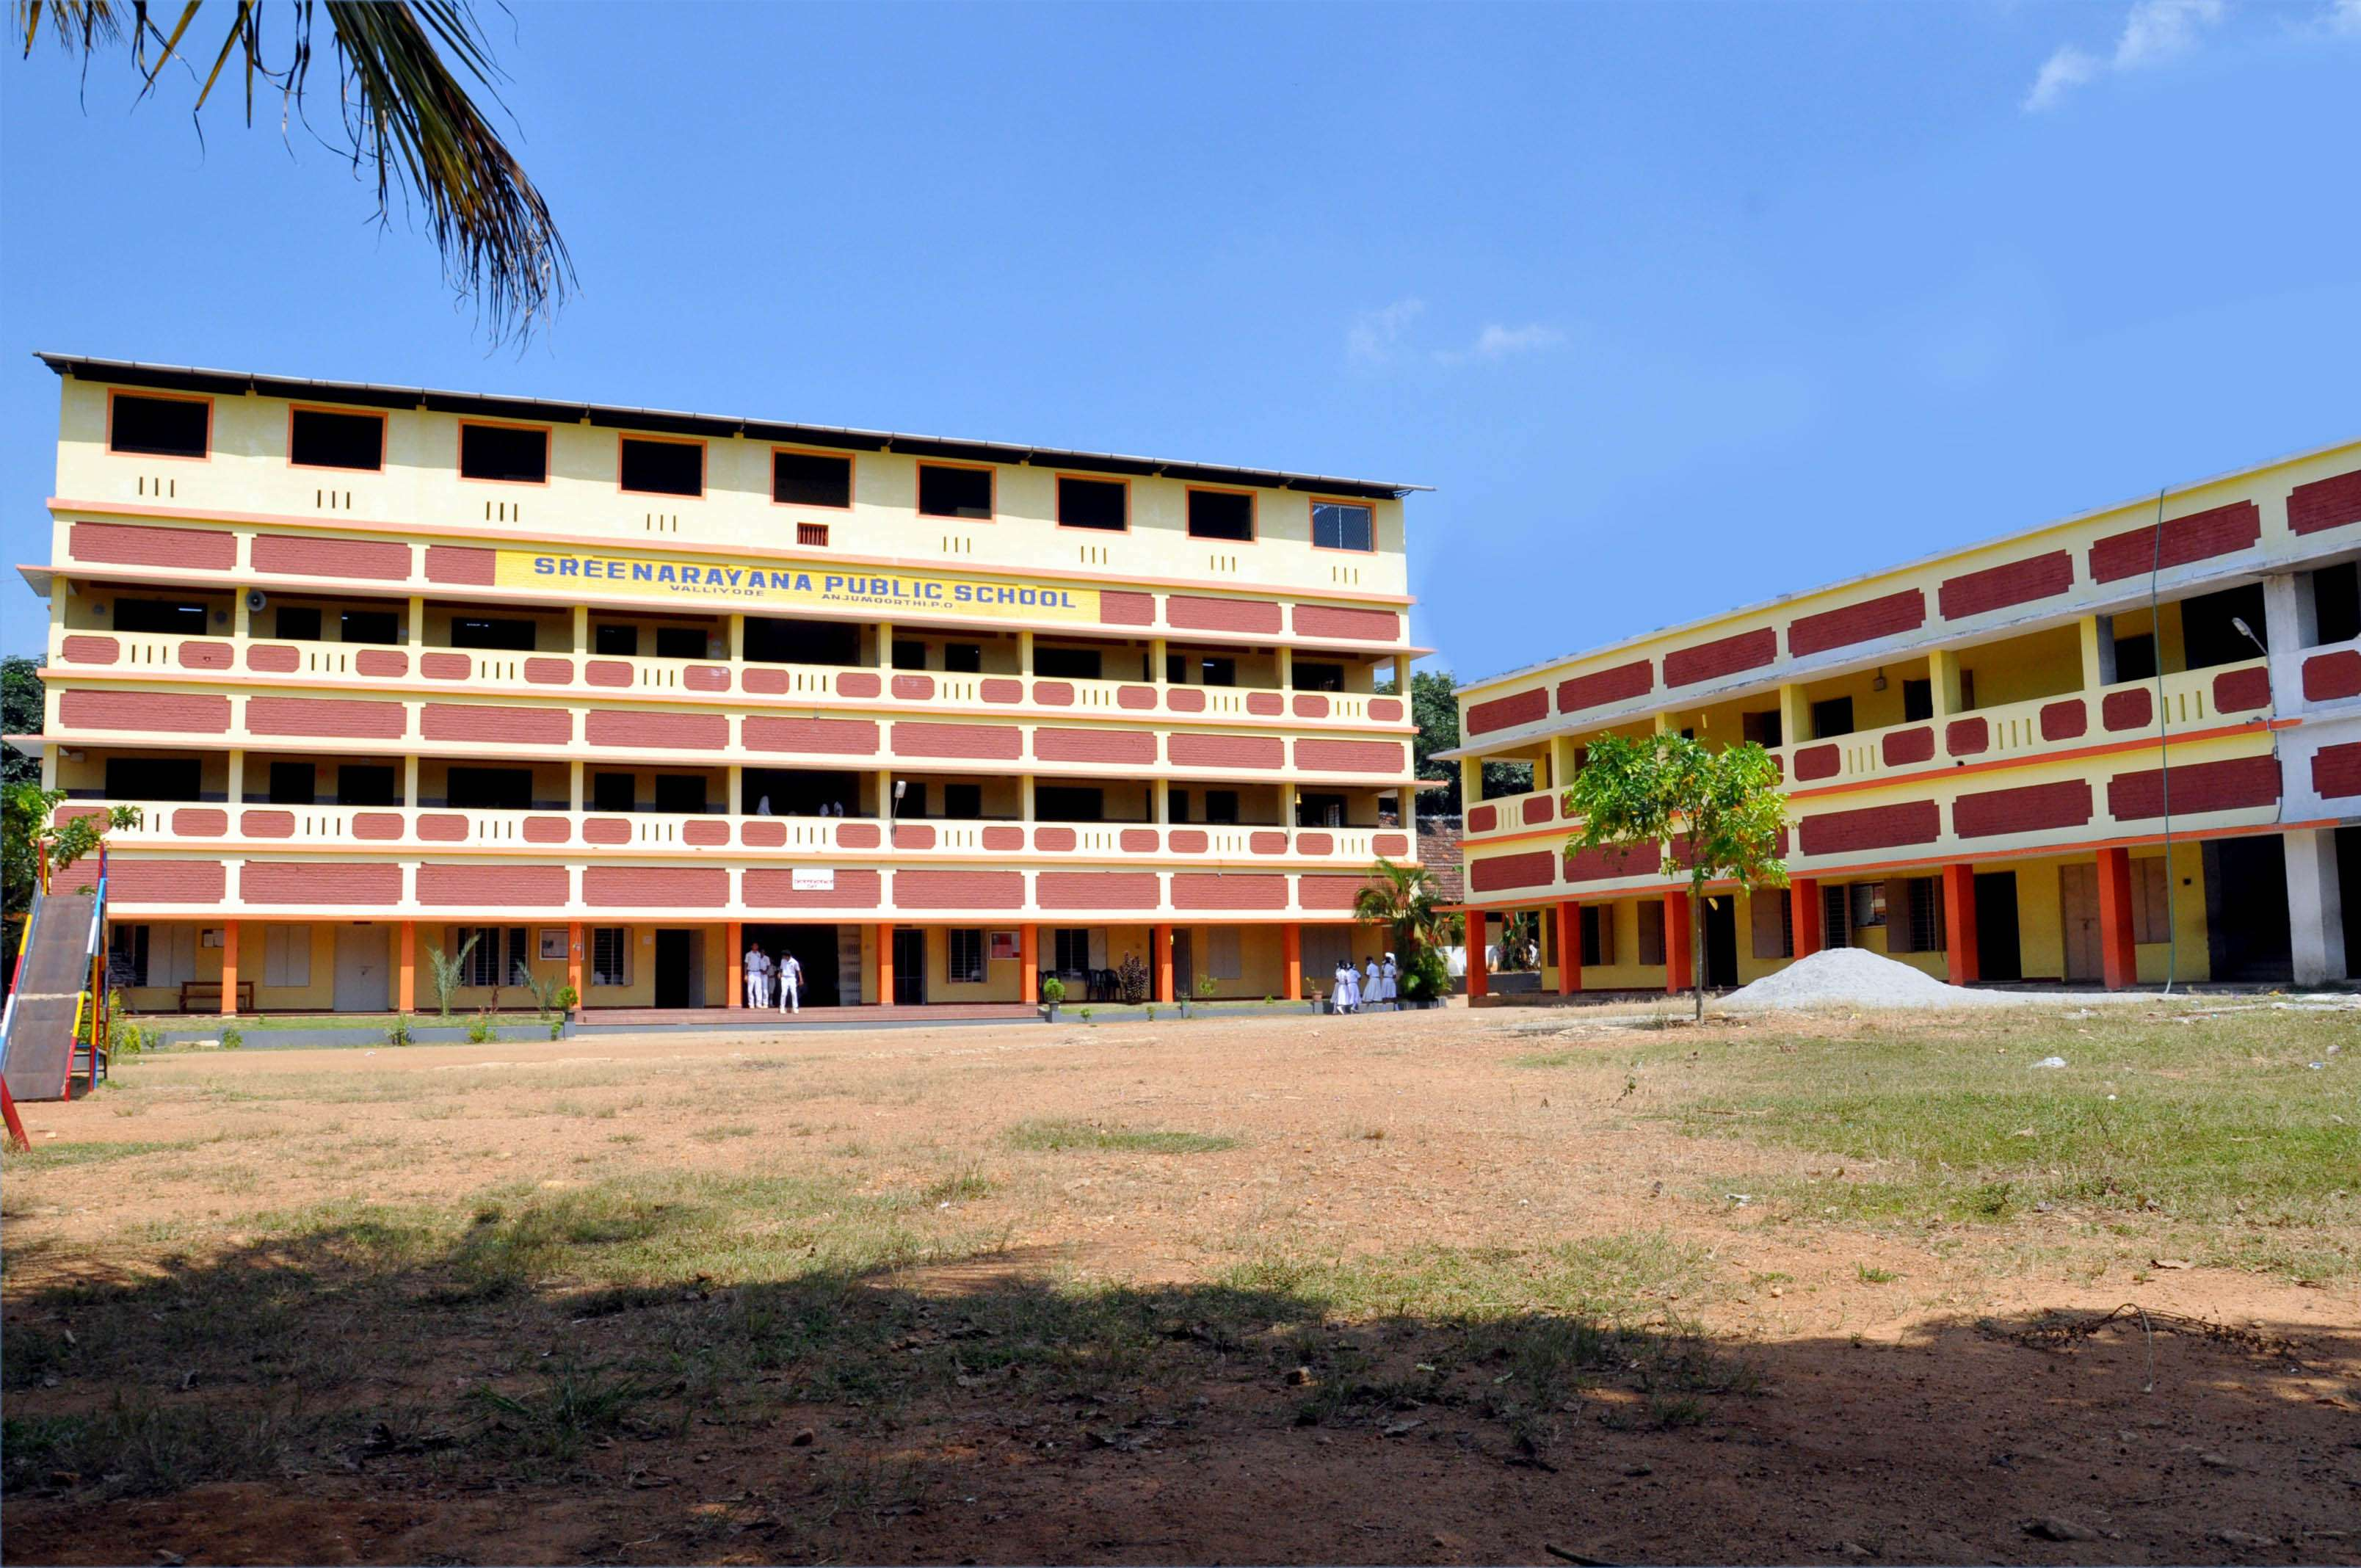 SREE NARAYANA PUBLIC SCHOOL VALLIYODE VADAKKENCHERRY ALATHUR PALAKKAD DISTT KERALA 930517